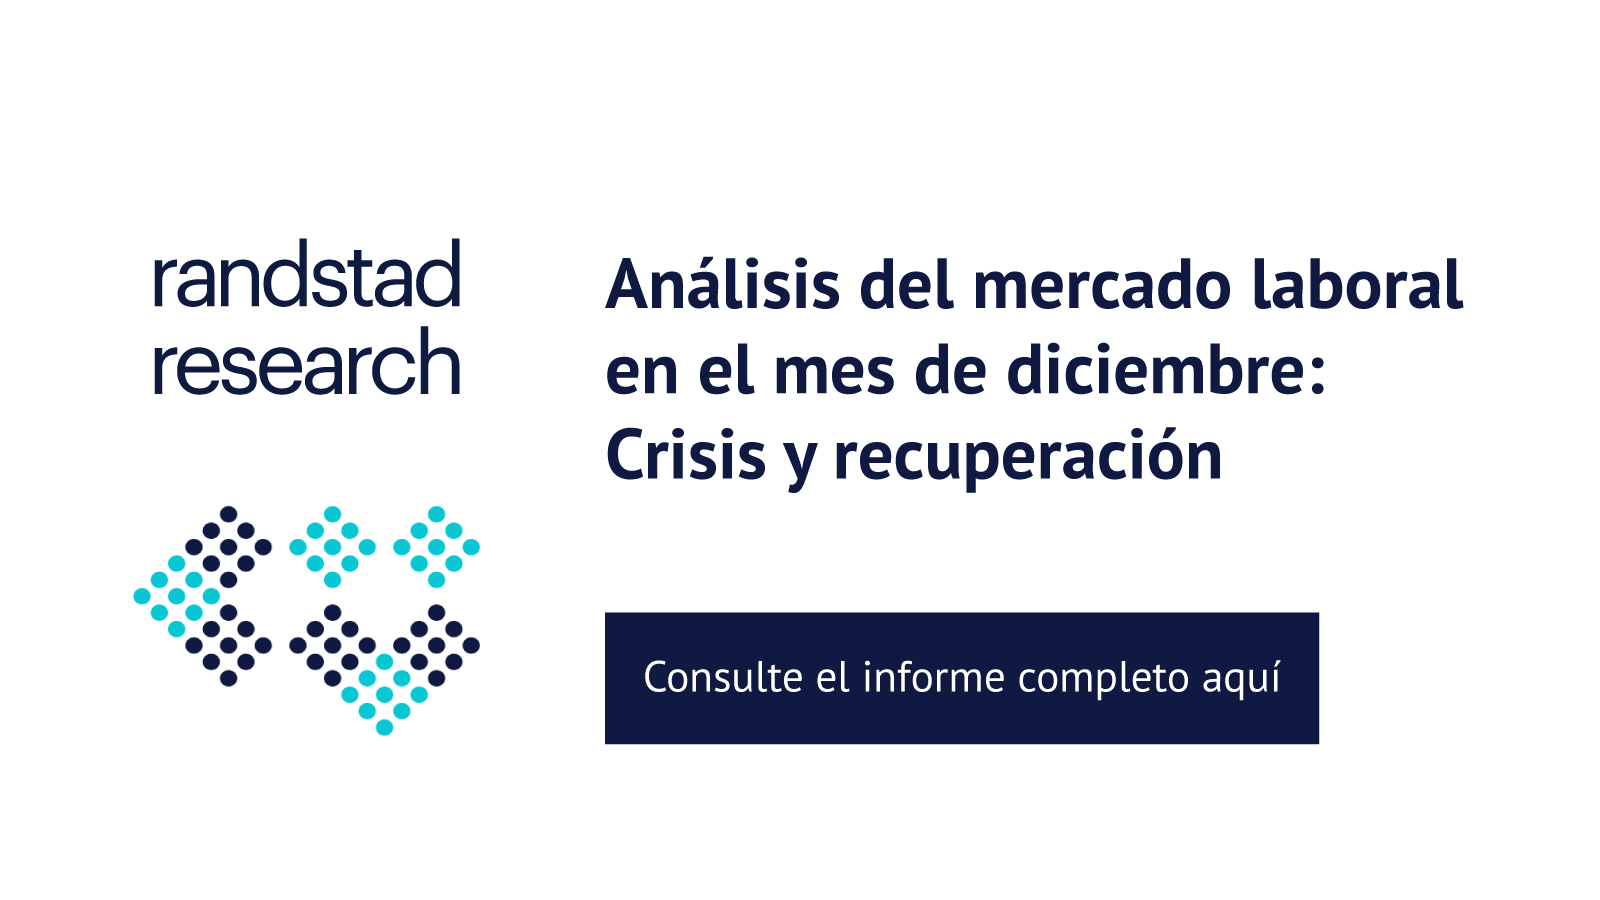 Randstad Research